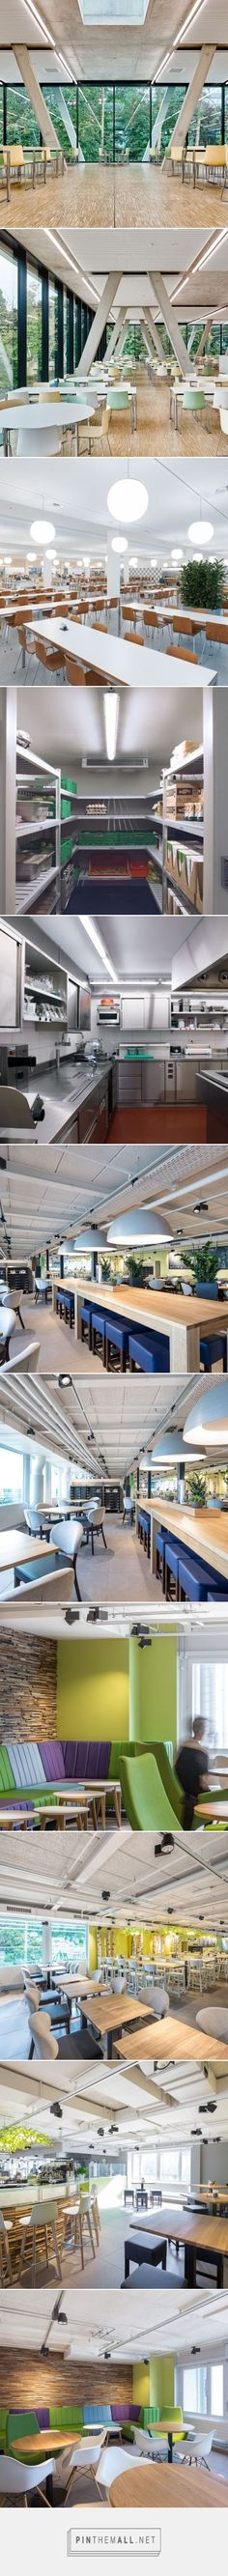 Regent Lighting - Illuminotecnica & Insegne - Realizzazioni - Retailand - created via https://pinthemall.net